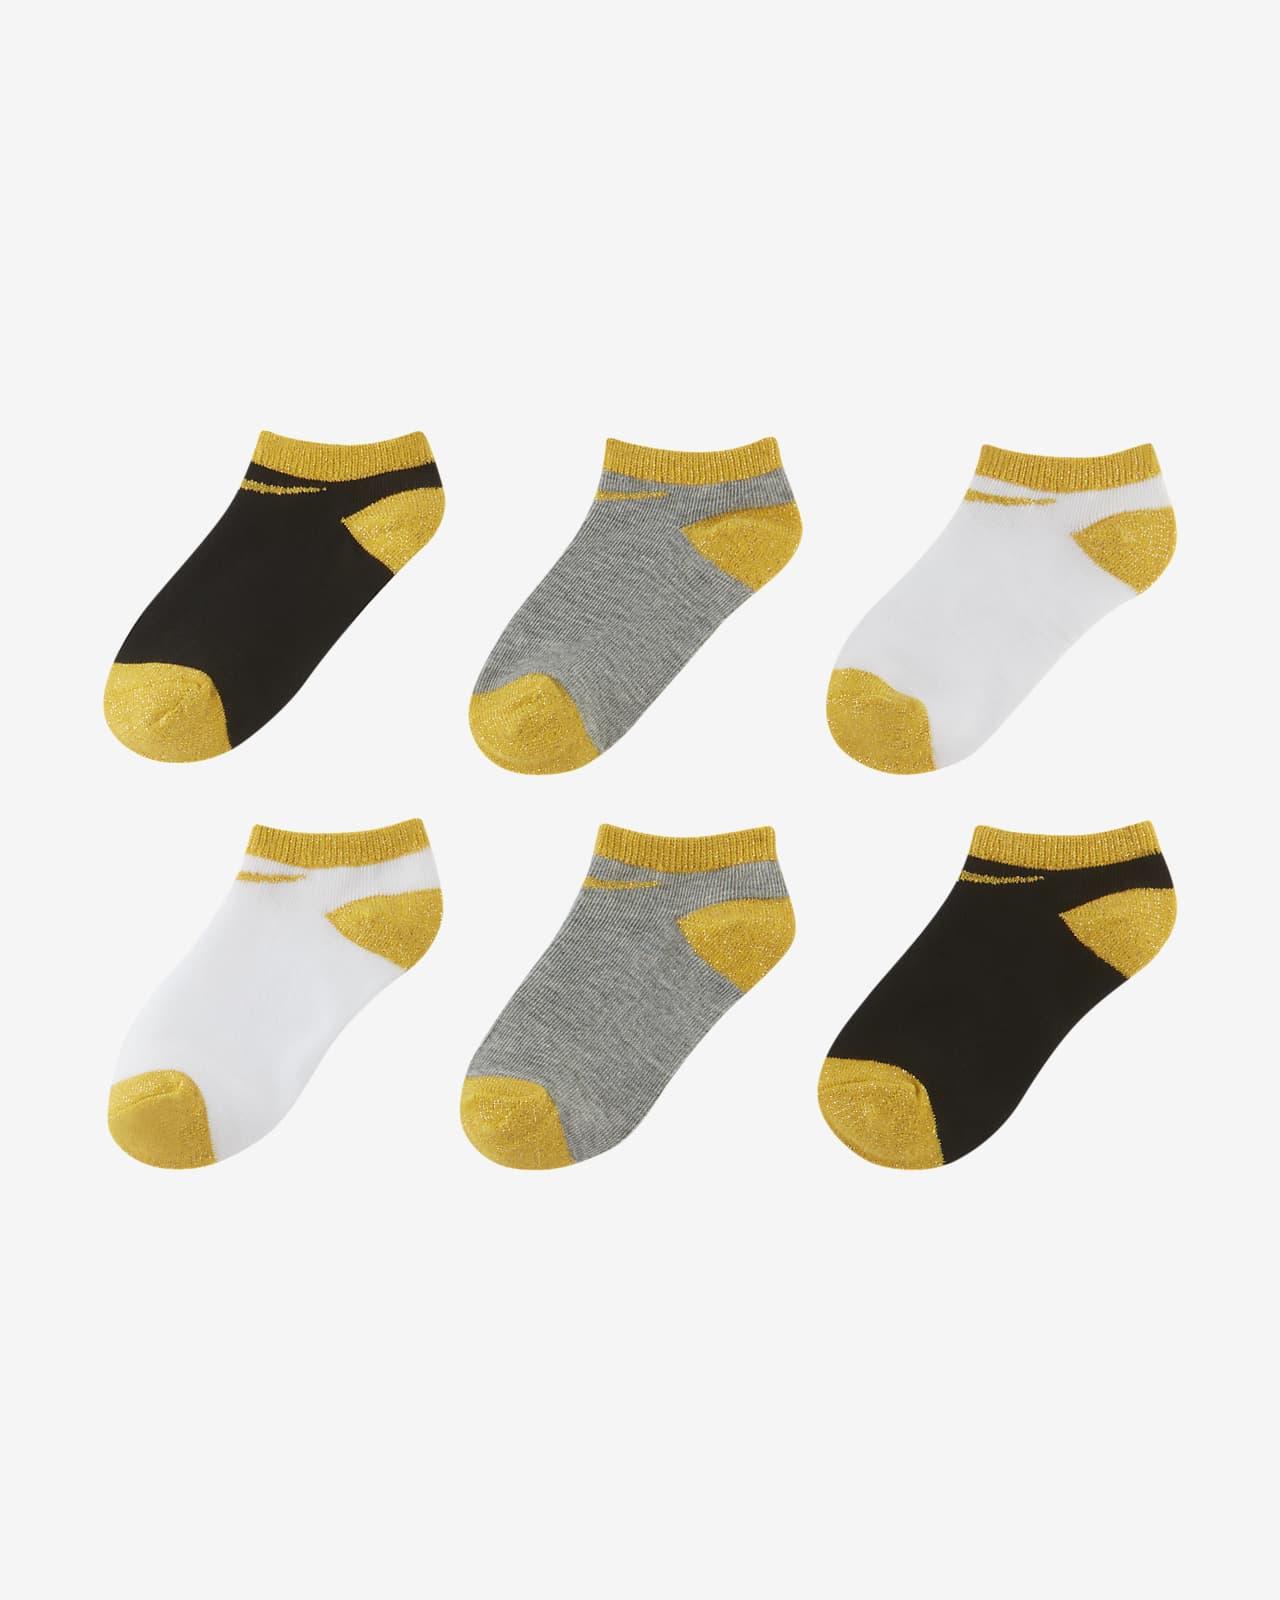 Nike Little Kids No-Show Socks (6 Pairs)